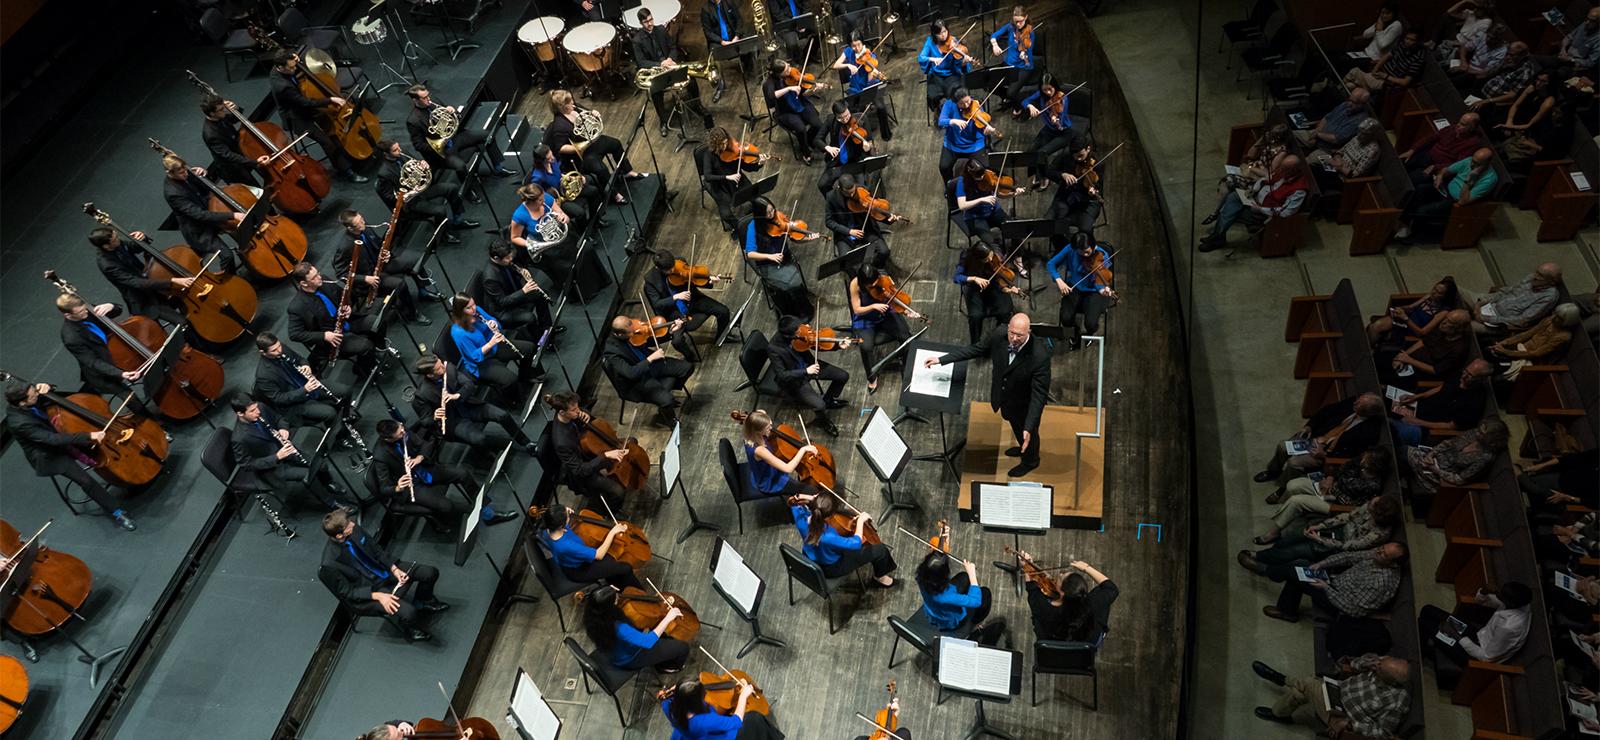 [Brahms & England] Photo by Matt Dine